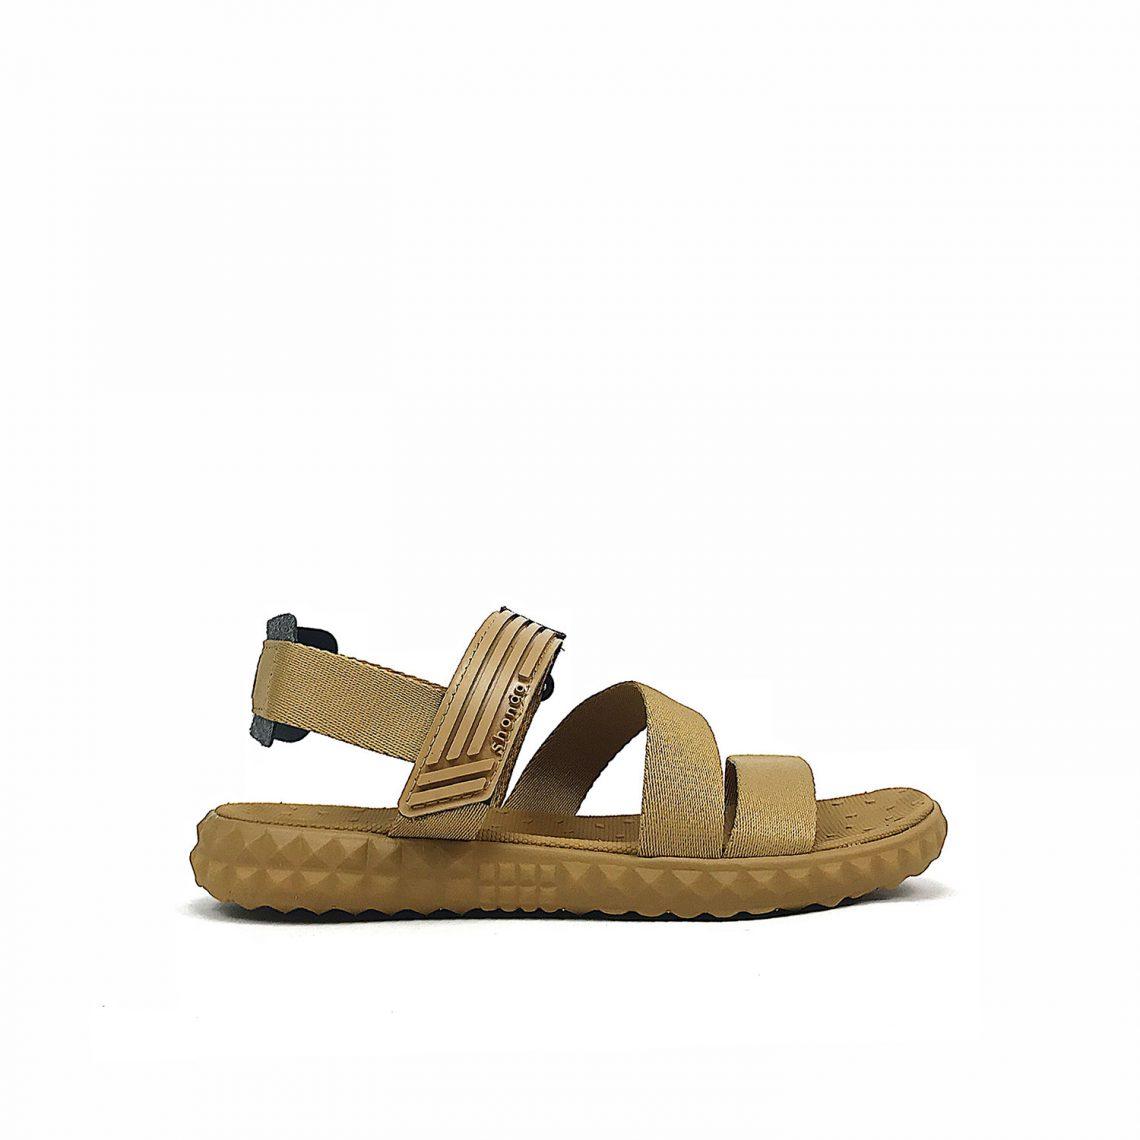 Giày Sandals Unisex SHONDO F6 F6M207 1